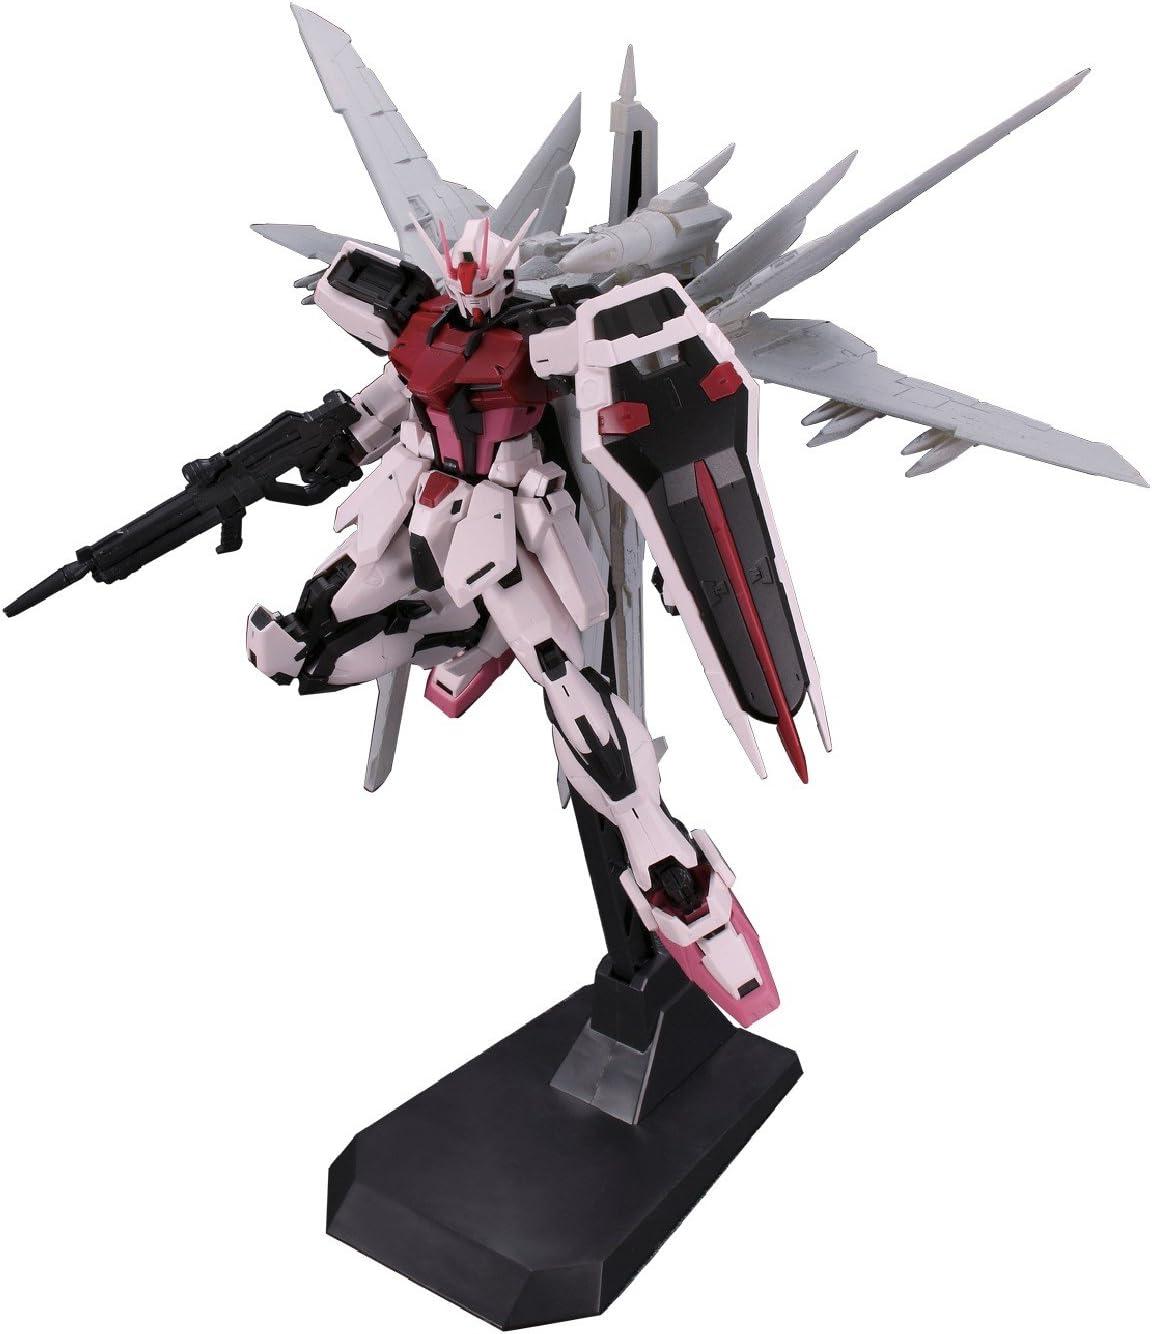 RM 1//100 Scale Action Figure Model Kit Bandai Hobby MG Aile Strike Gundam Ver